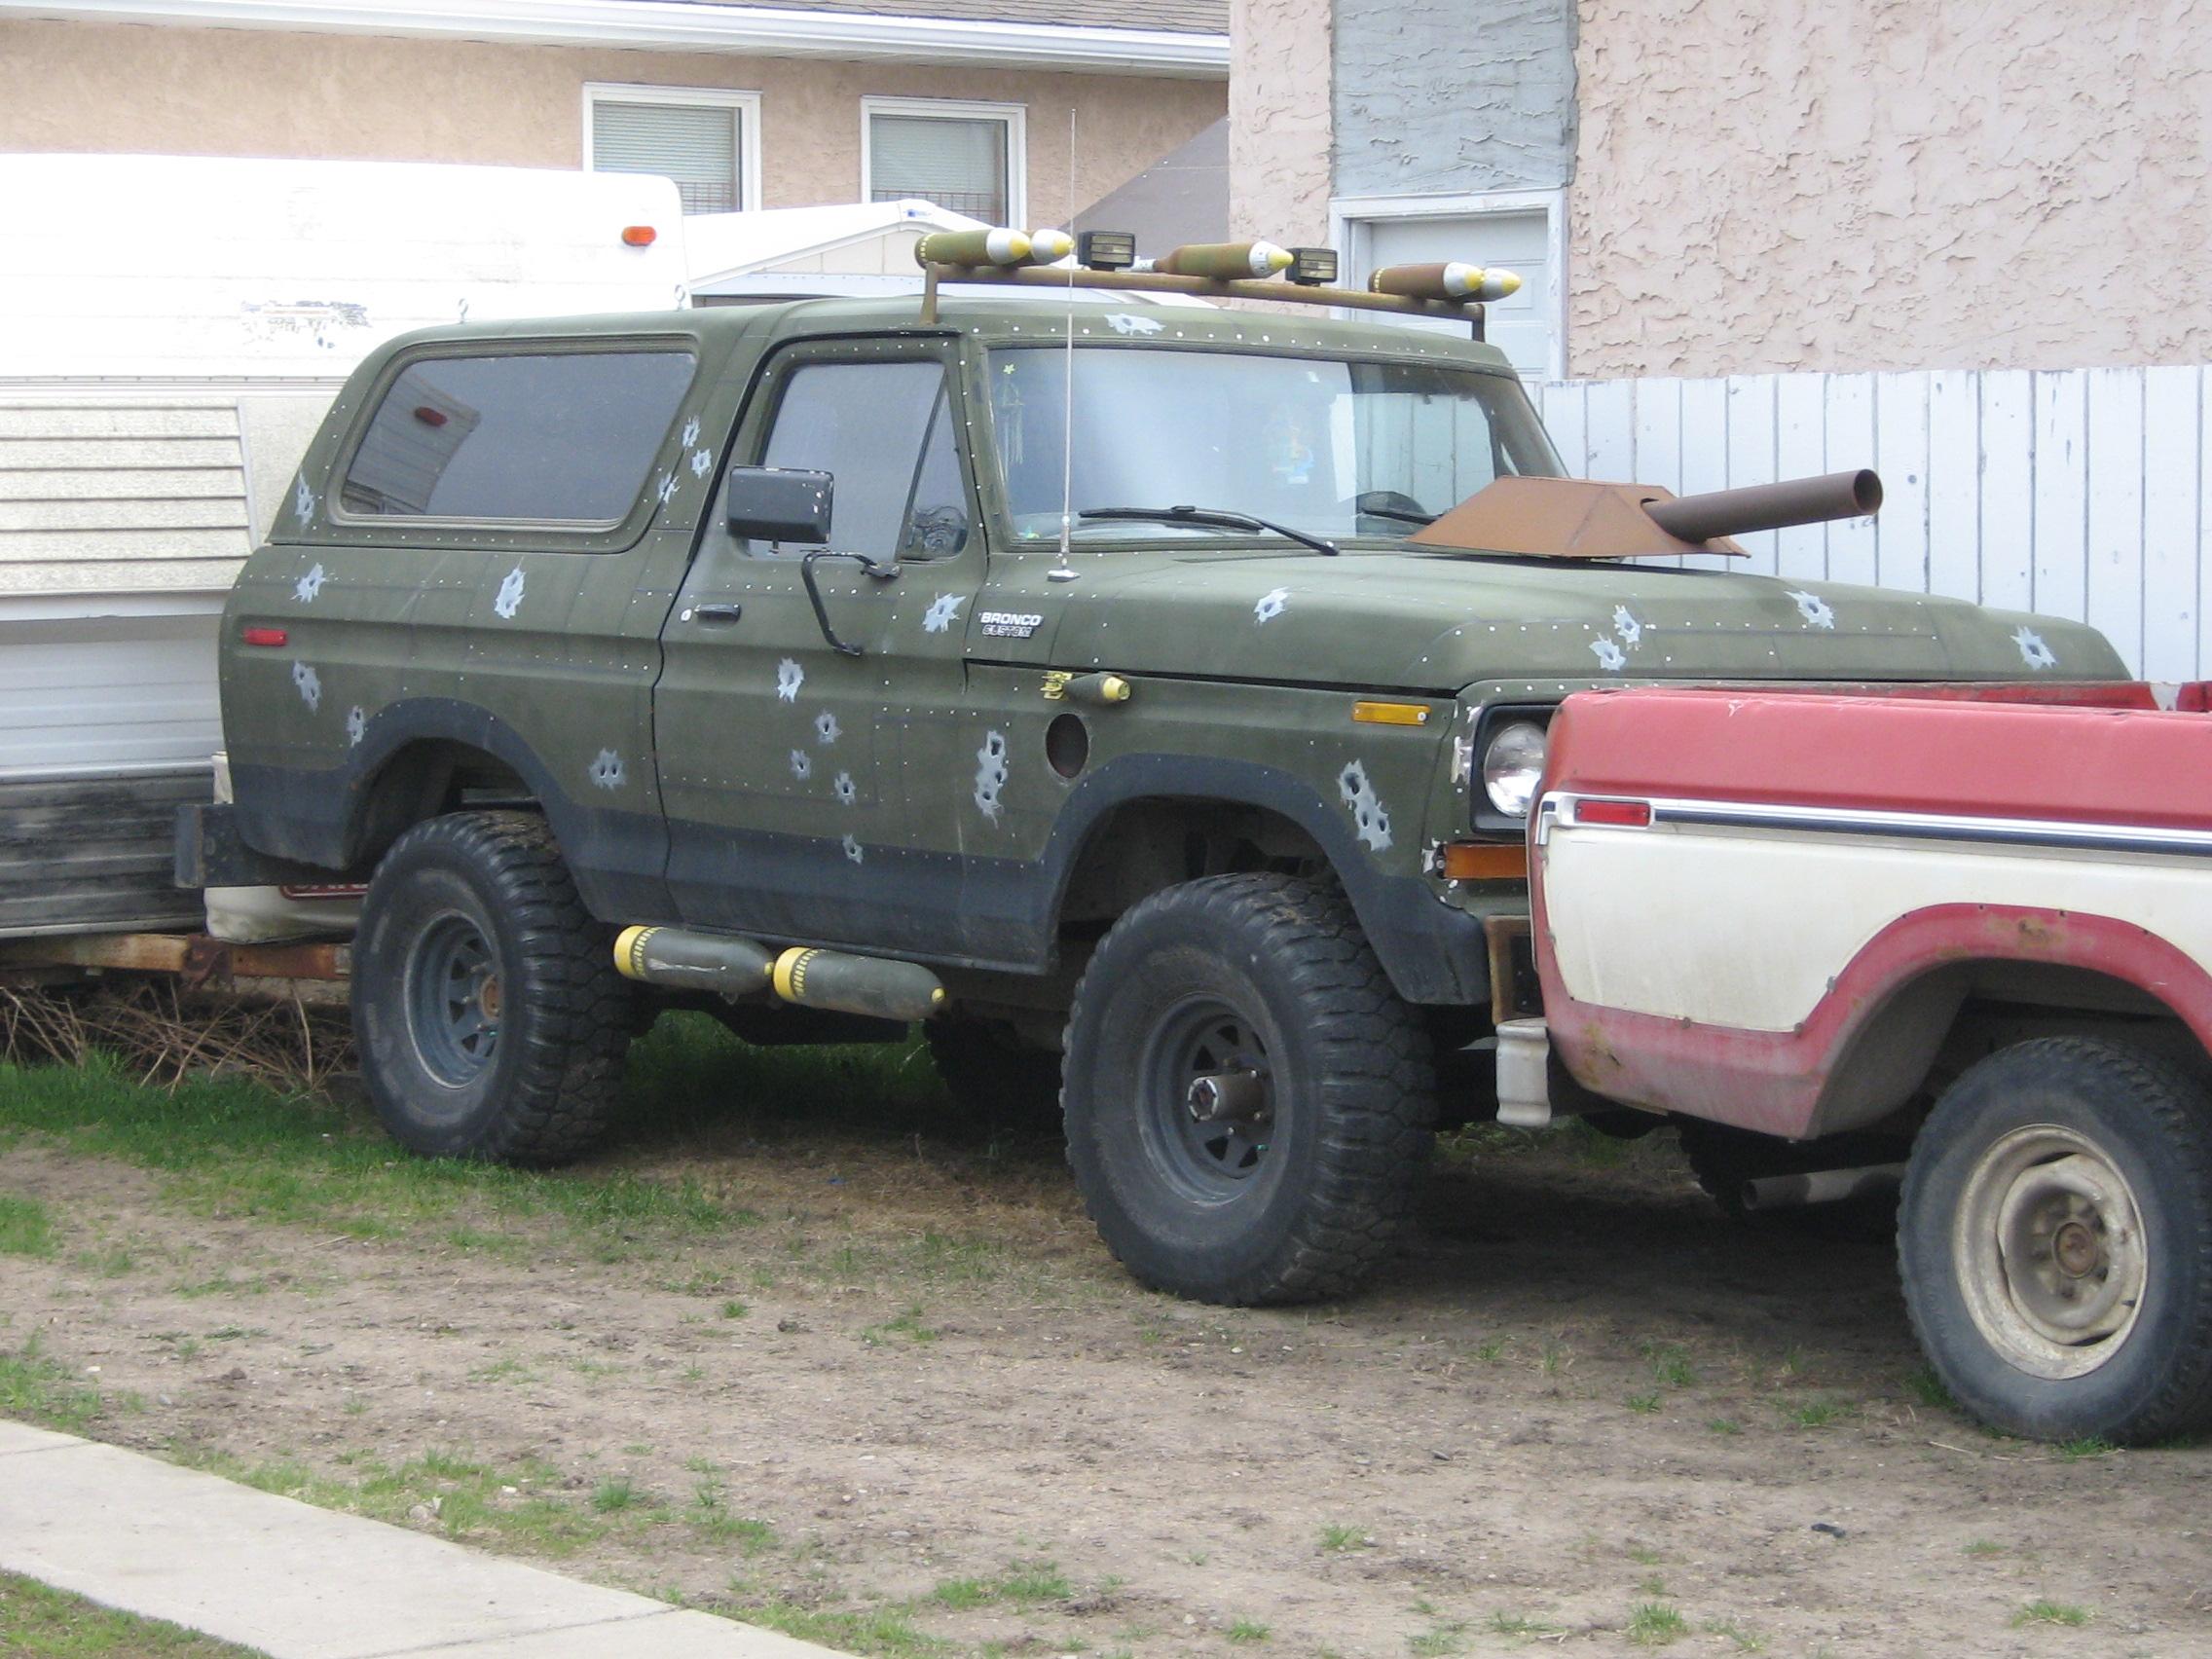 Rust Oleum Truck Bed Used Mode